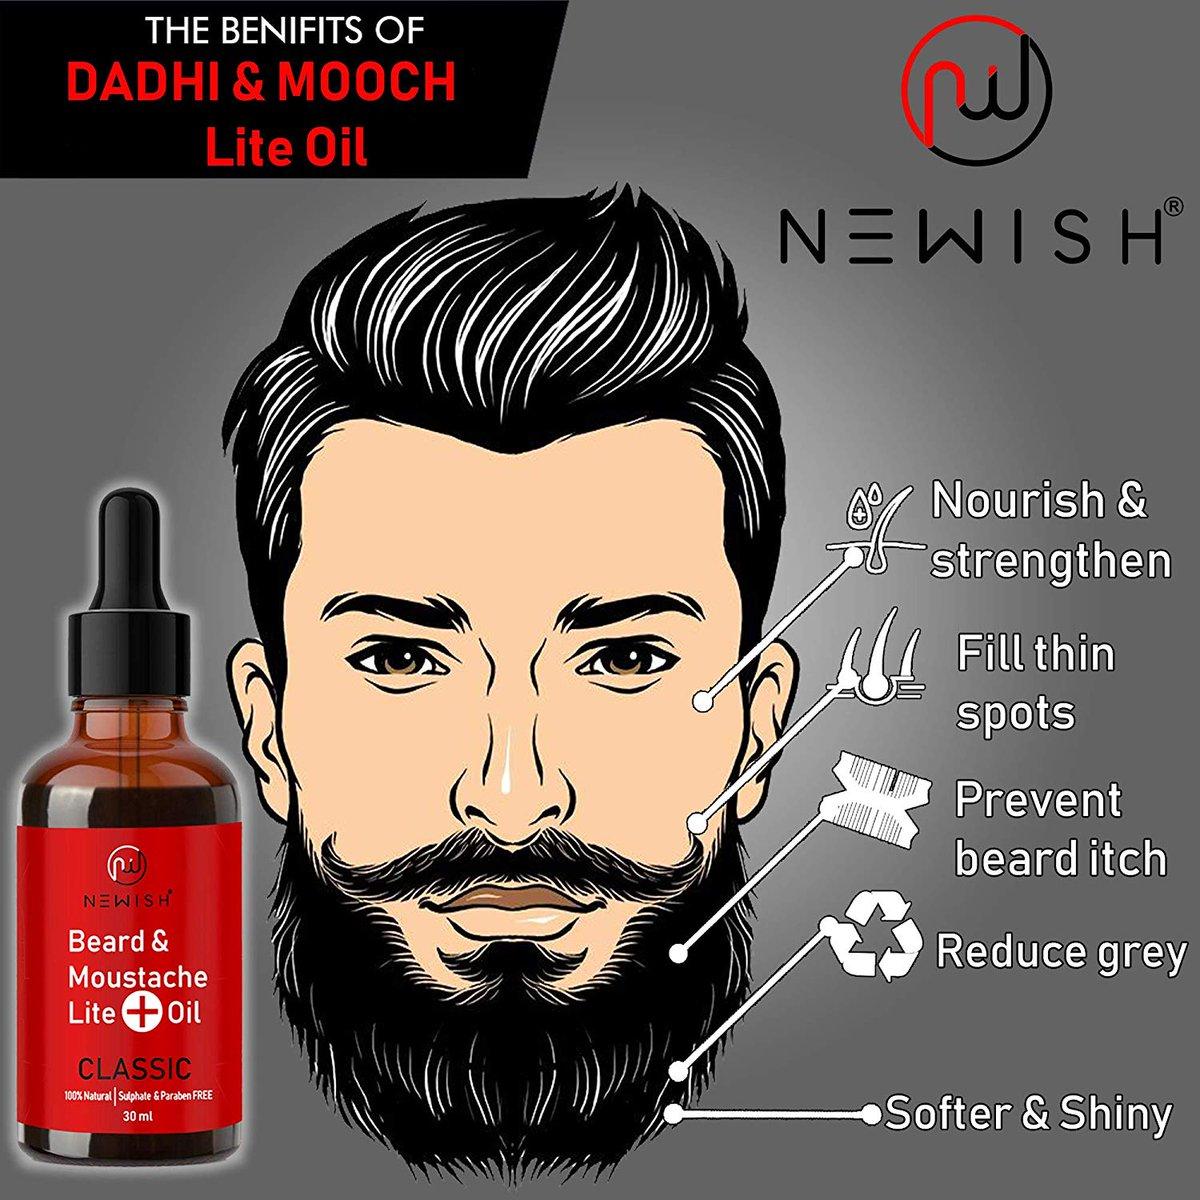 Newish Lite Mooch & Beard Oil For Men  Newish Lite Moustache Beard Oil strengthens the beard and provides deep nourishment to the hair follicles leading to healthy, stronger, fuzz-free beards.  Buy Now: https://amzn.to/34yylvC  #beardoil #beardoils #beardoilnatural #litebeardpic.twitter.com/MT1FhVbzlp